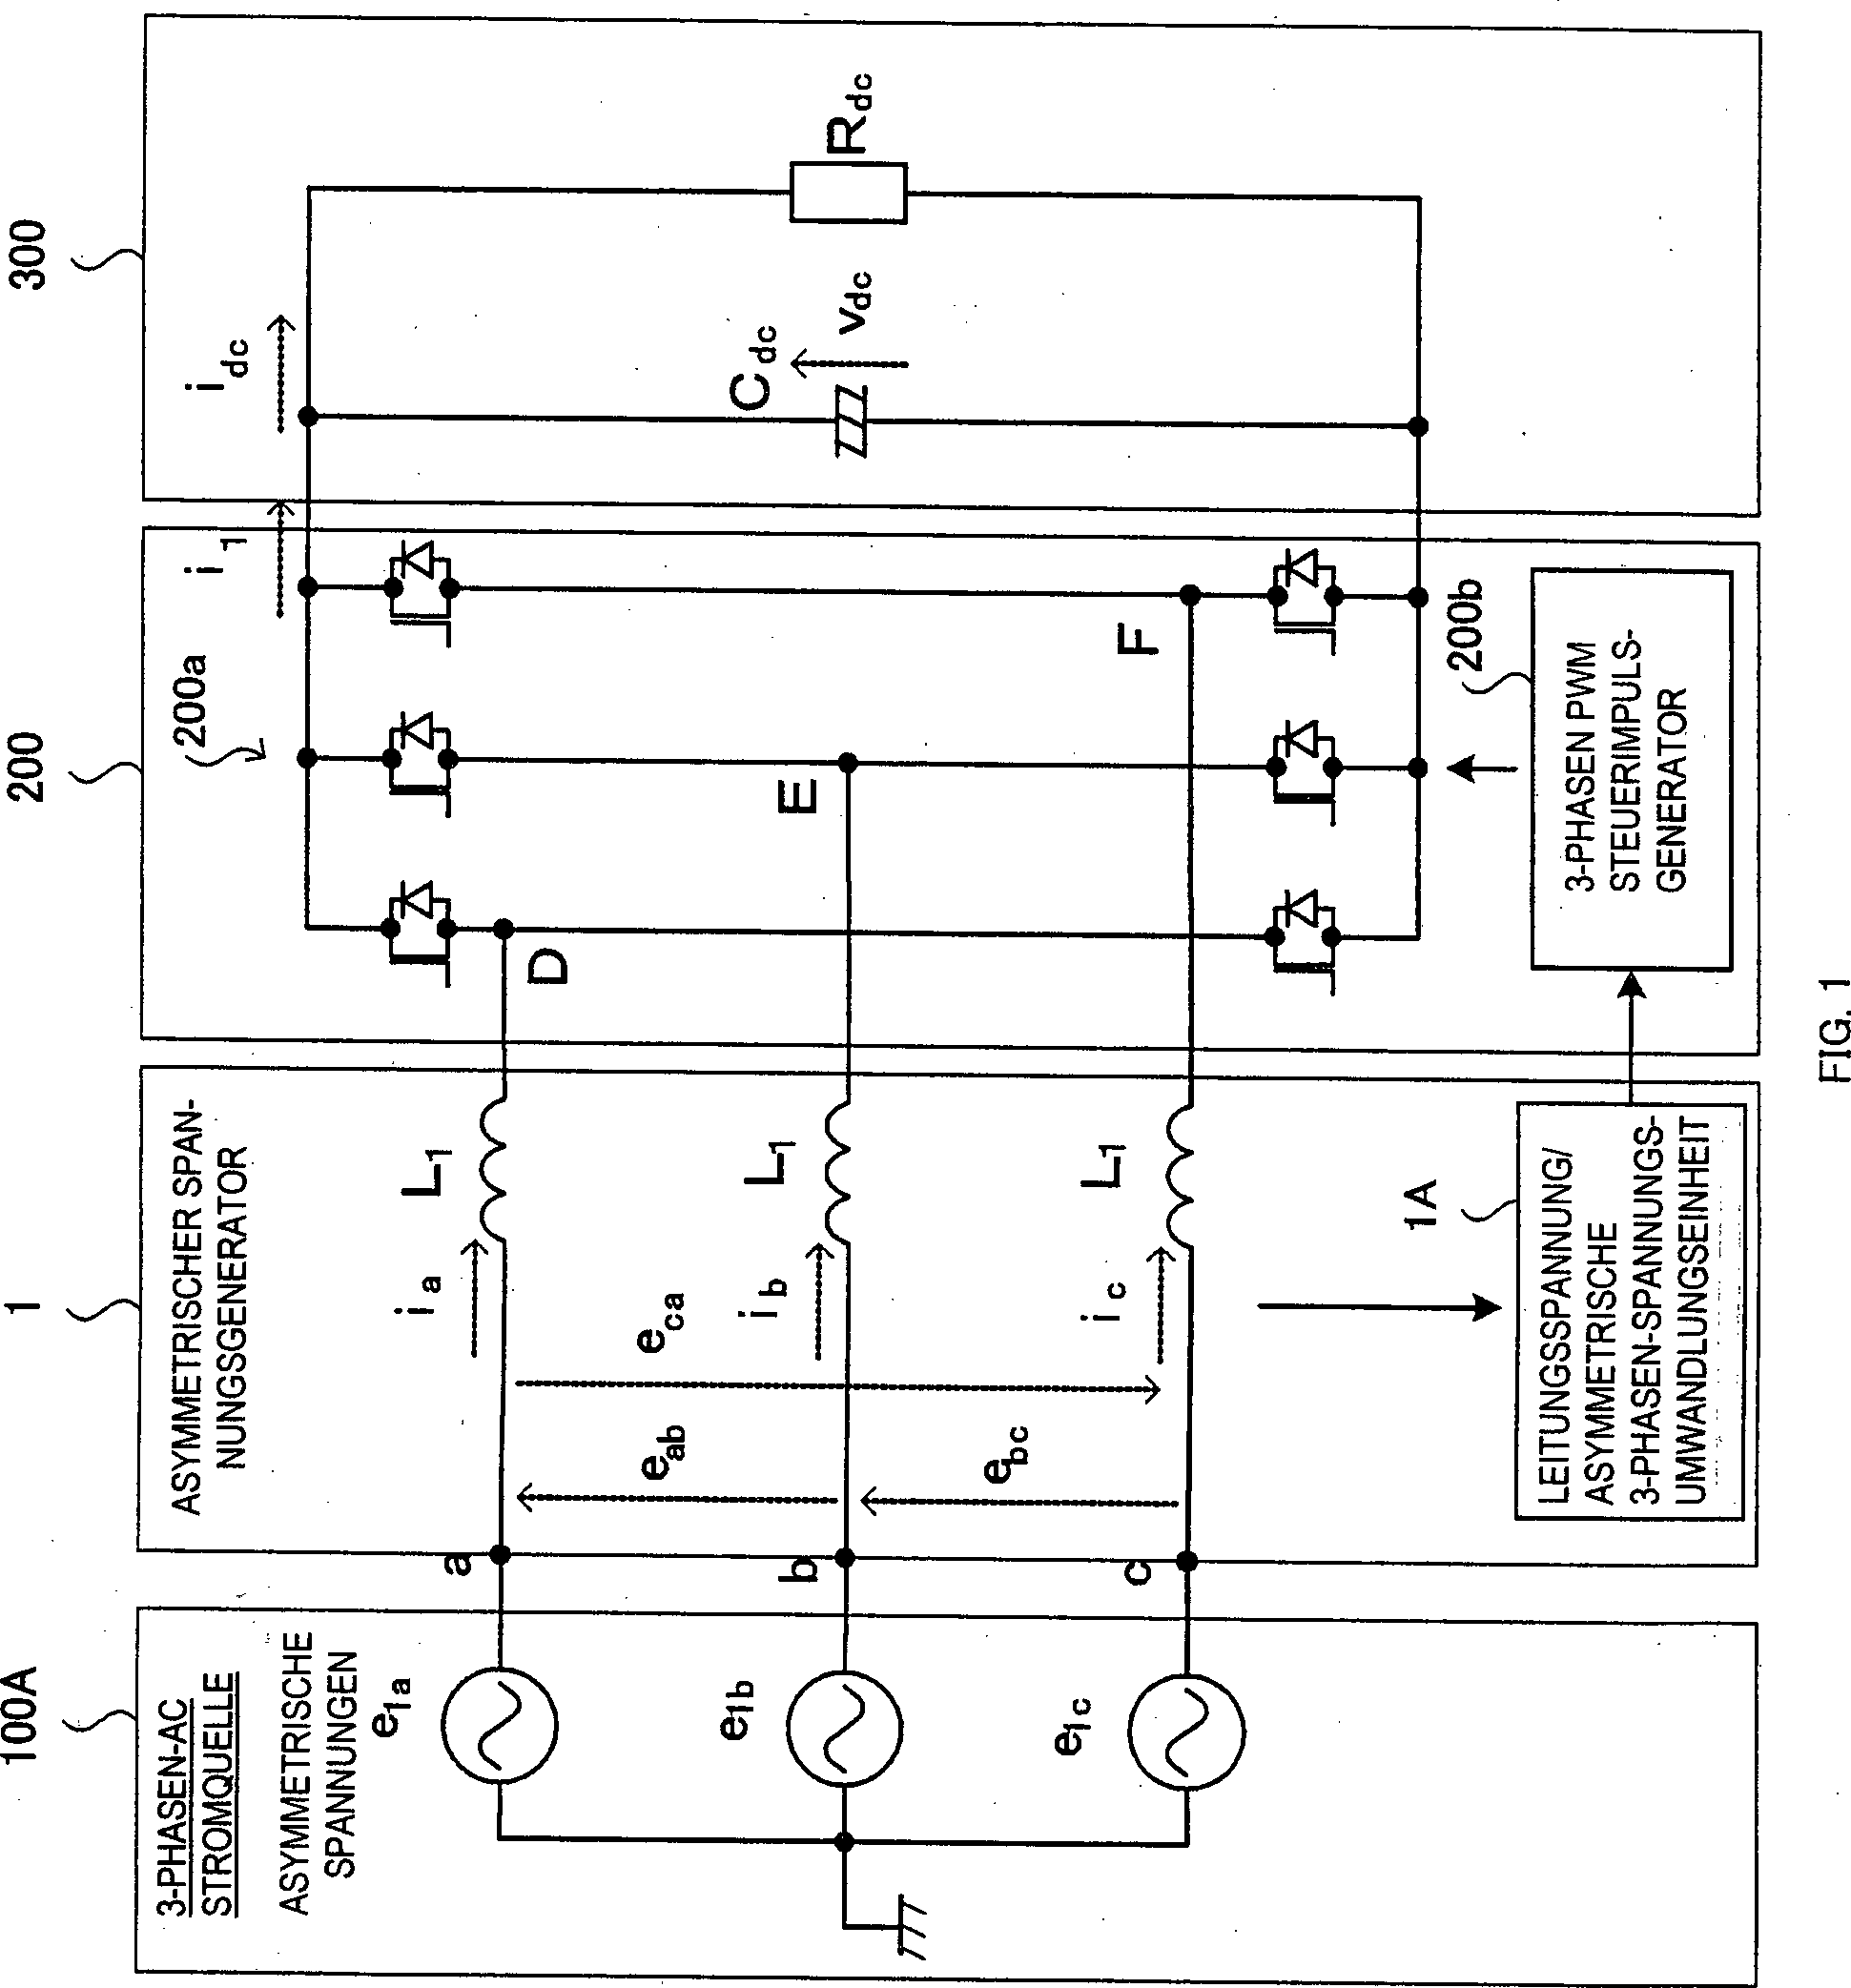 patent de102010053638a1 kompensationsverfahren f r asymmetrische spannung asymmetrischer. Black Bedroom Furniture Sets. Home Design Ideas